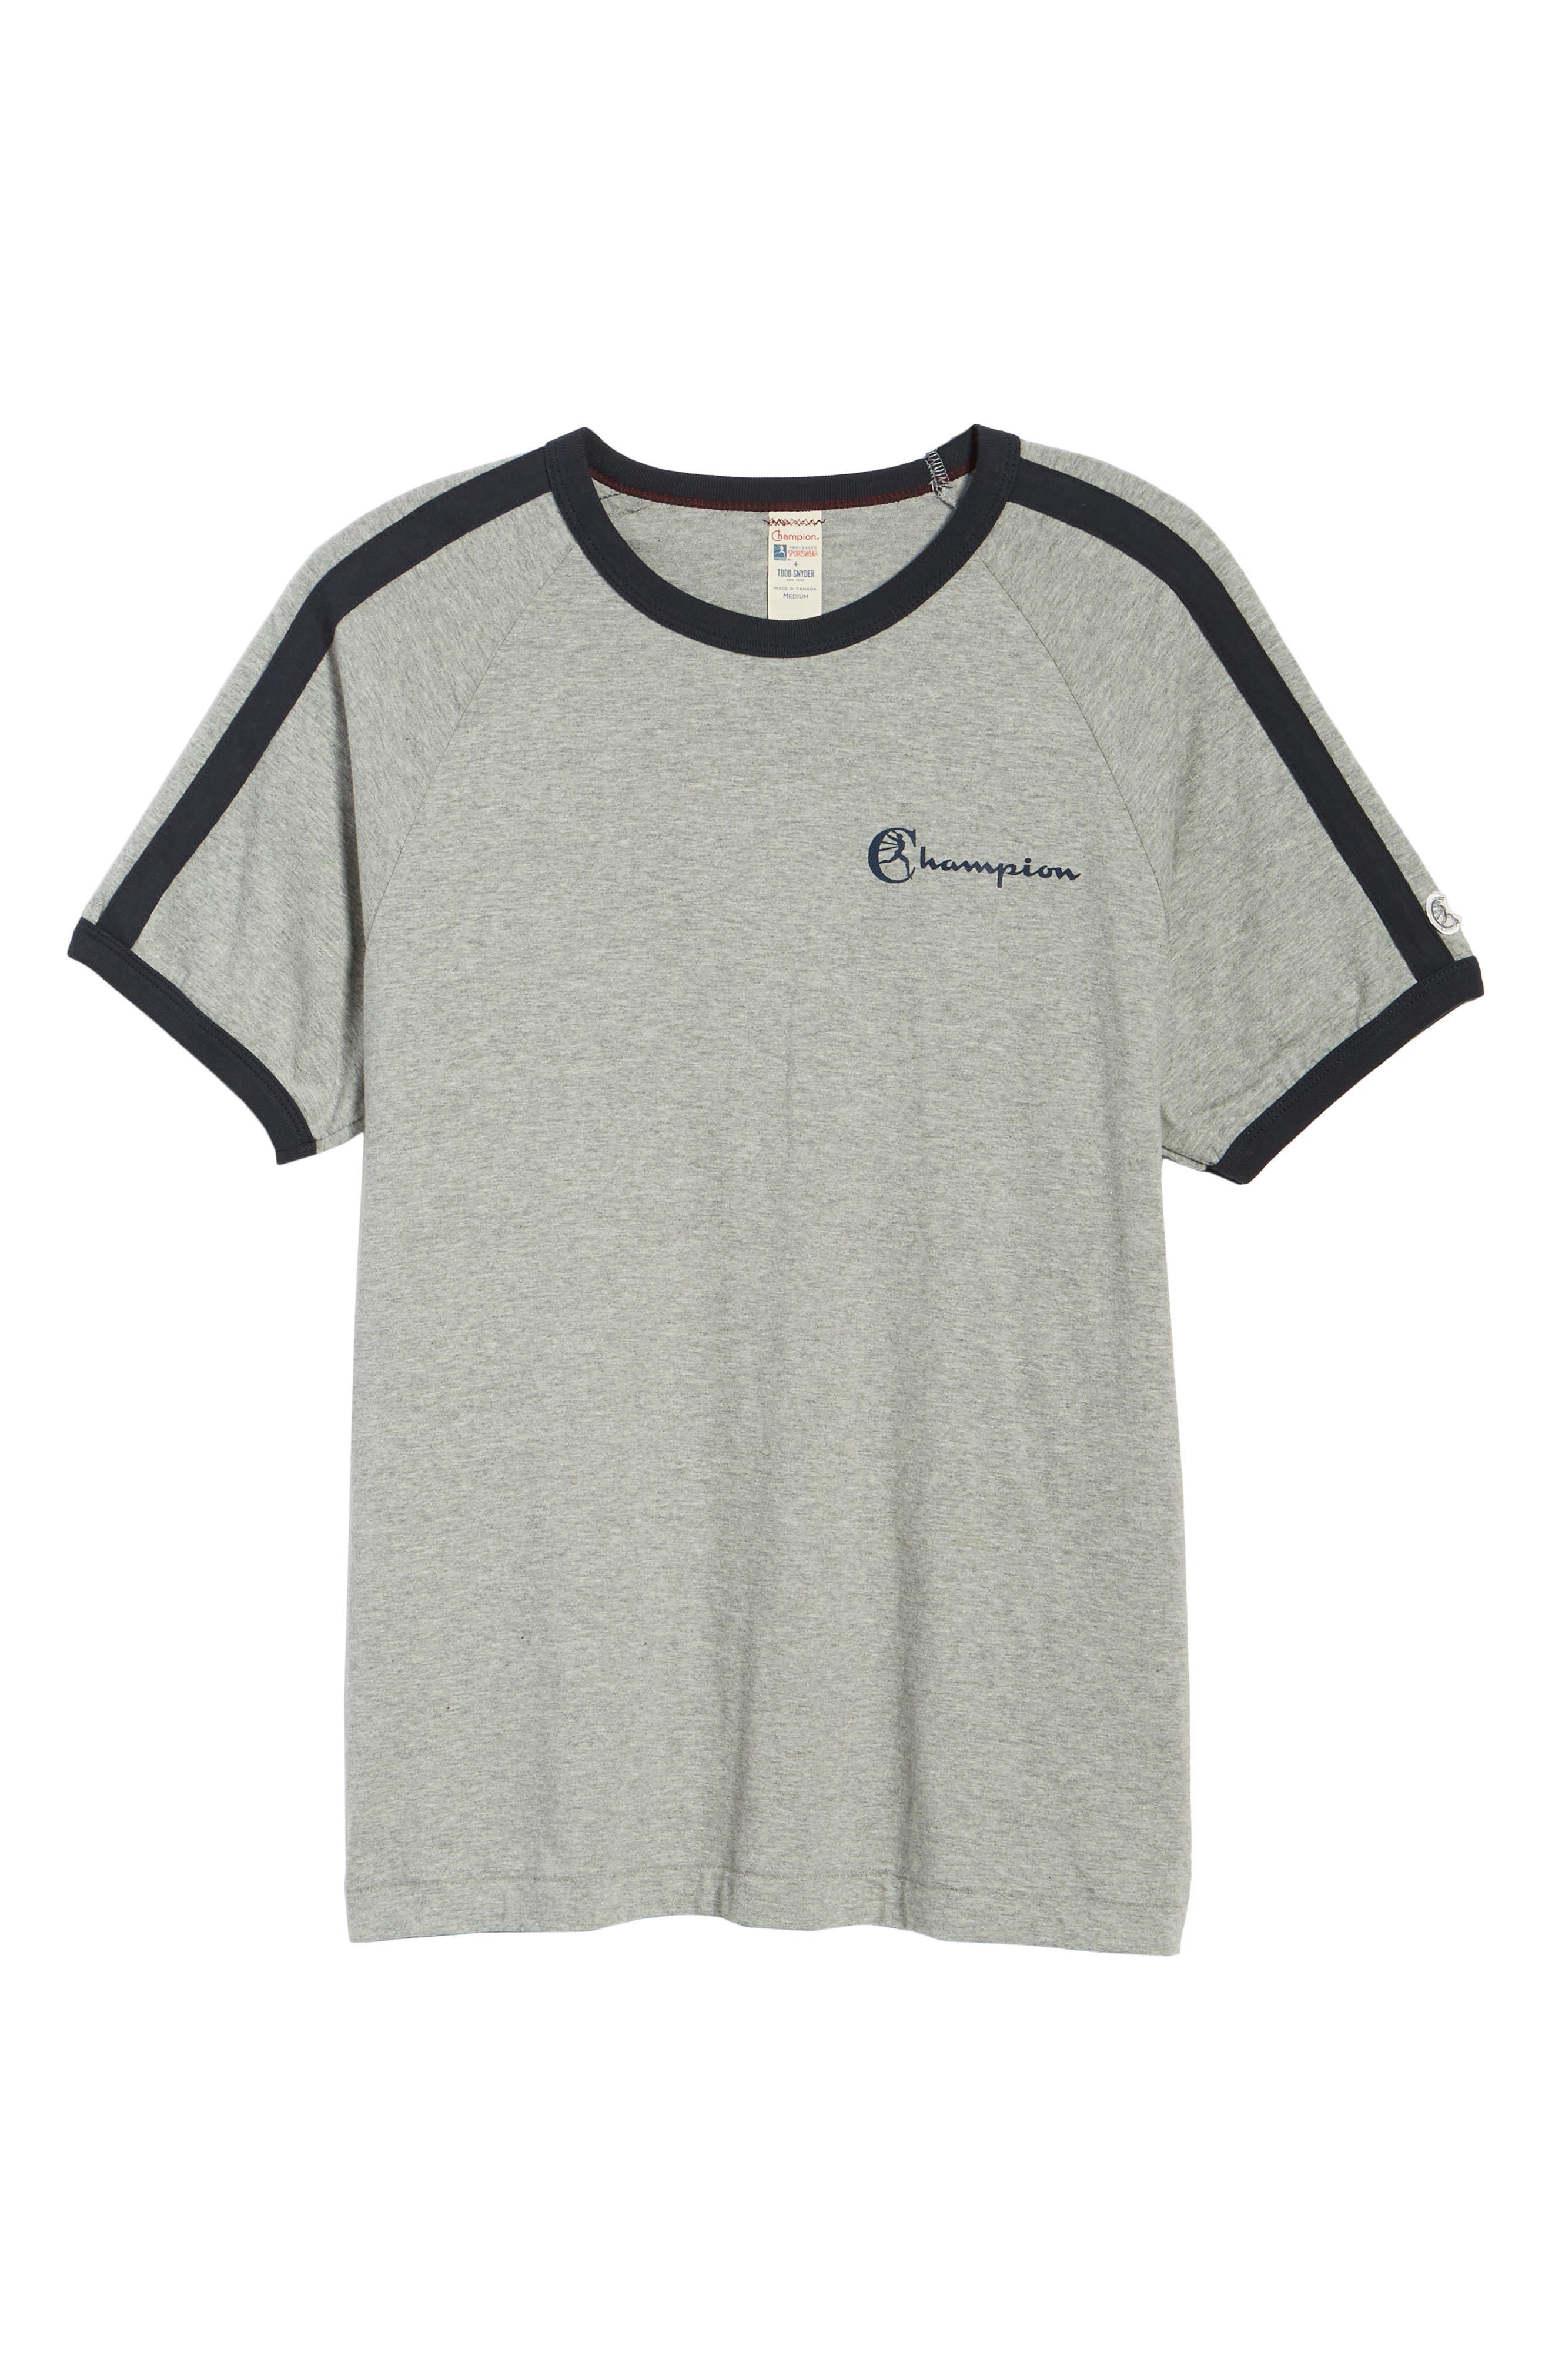 6066cc3f Todd Snyder + Champion Crewneck T-Shirts for Men: Long & Short Sleeves |  Nordstrom